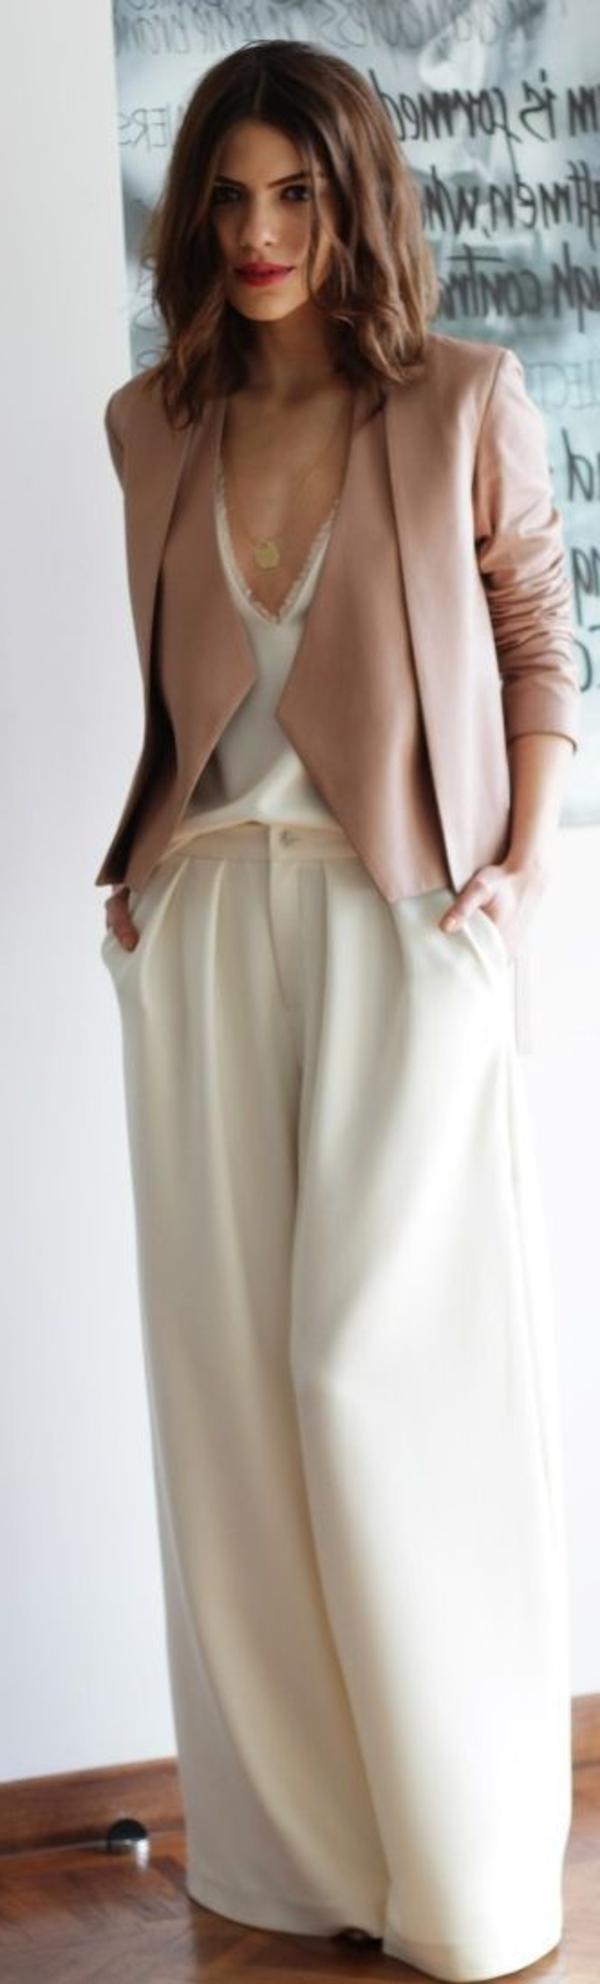 tenue-de-soirée-ou-tenue-chic-en-cuir-zose-pas-typique